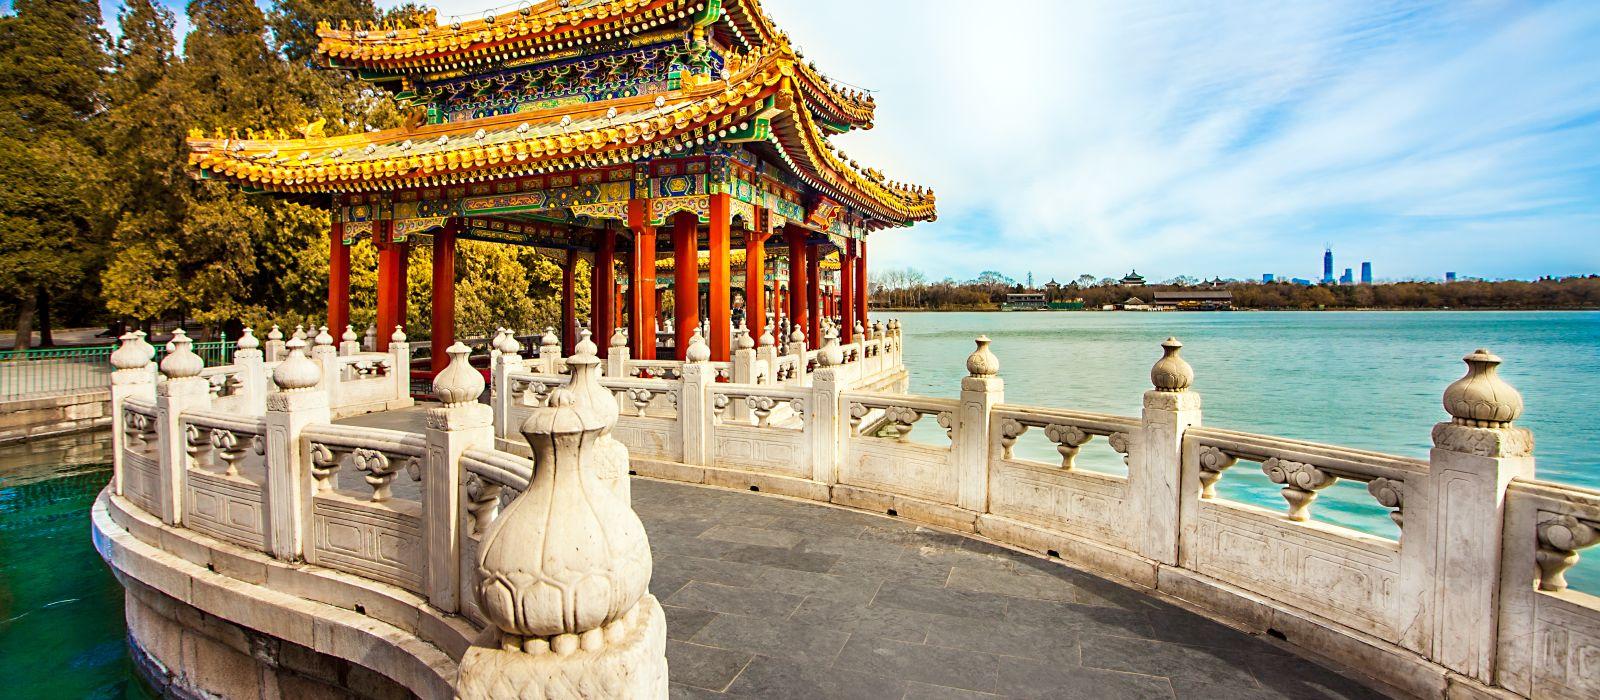 Imperial Cities, Tibet & Yangtze River Cruise Tour Trip 3